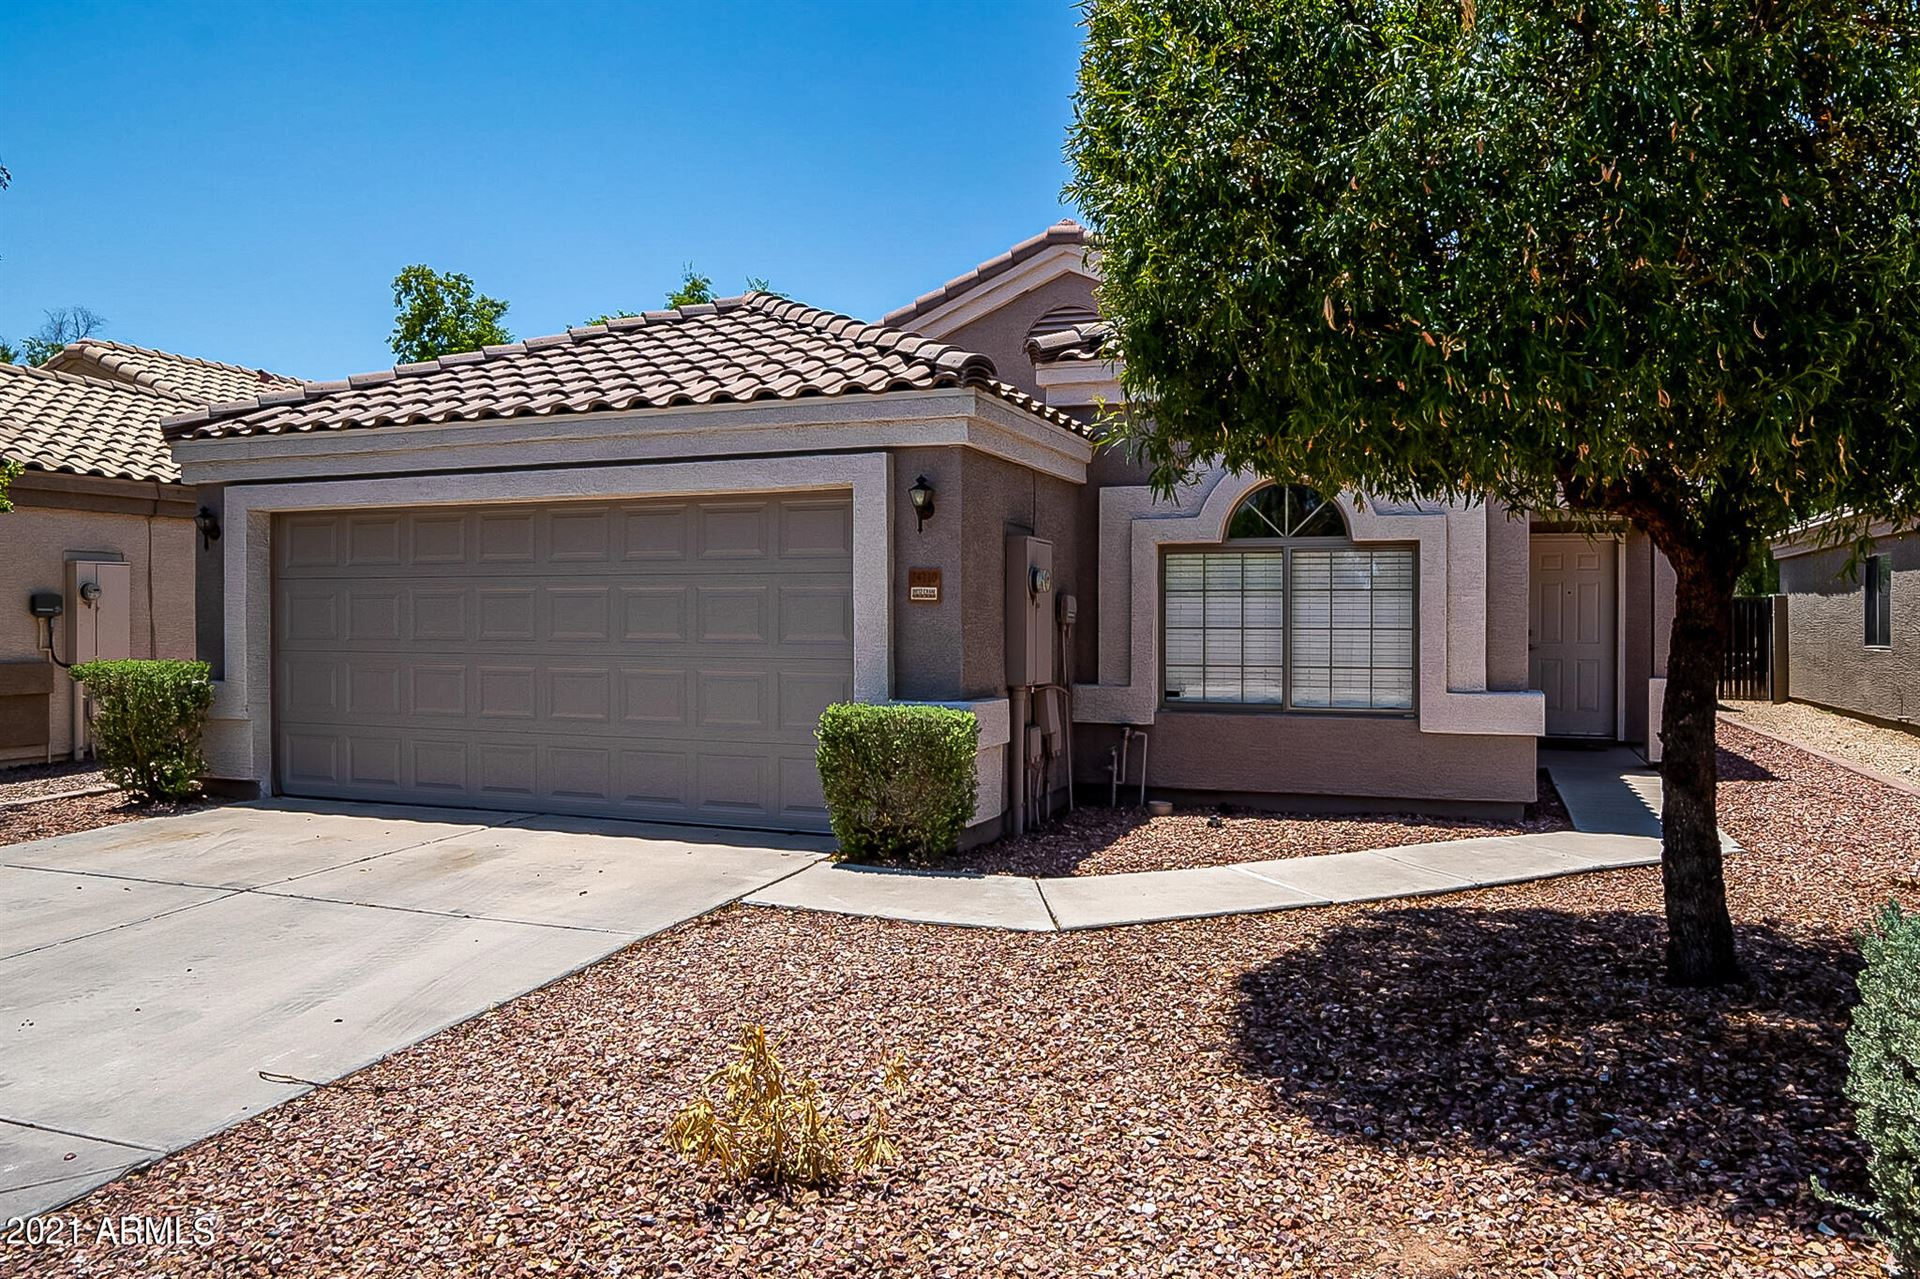 Photo of 14110 N 130TH Lane, El Mirage, AZ 85335 (MLS # 6267353)